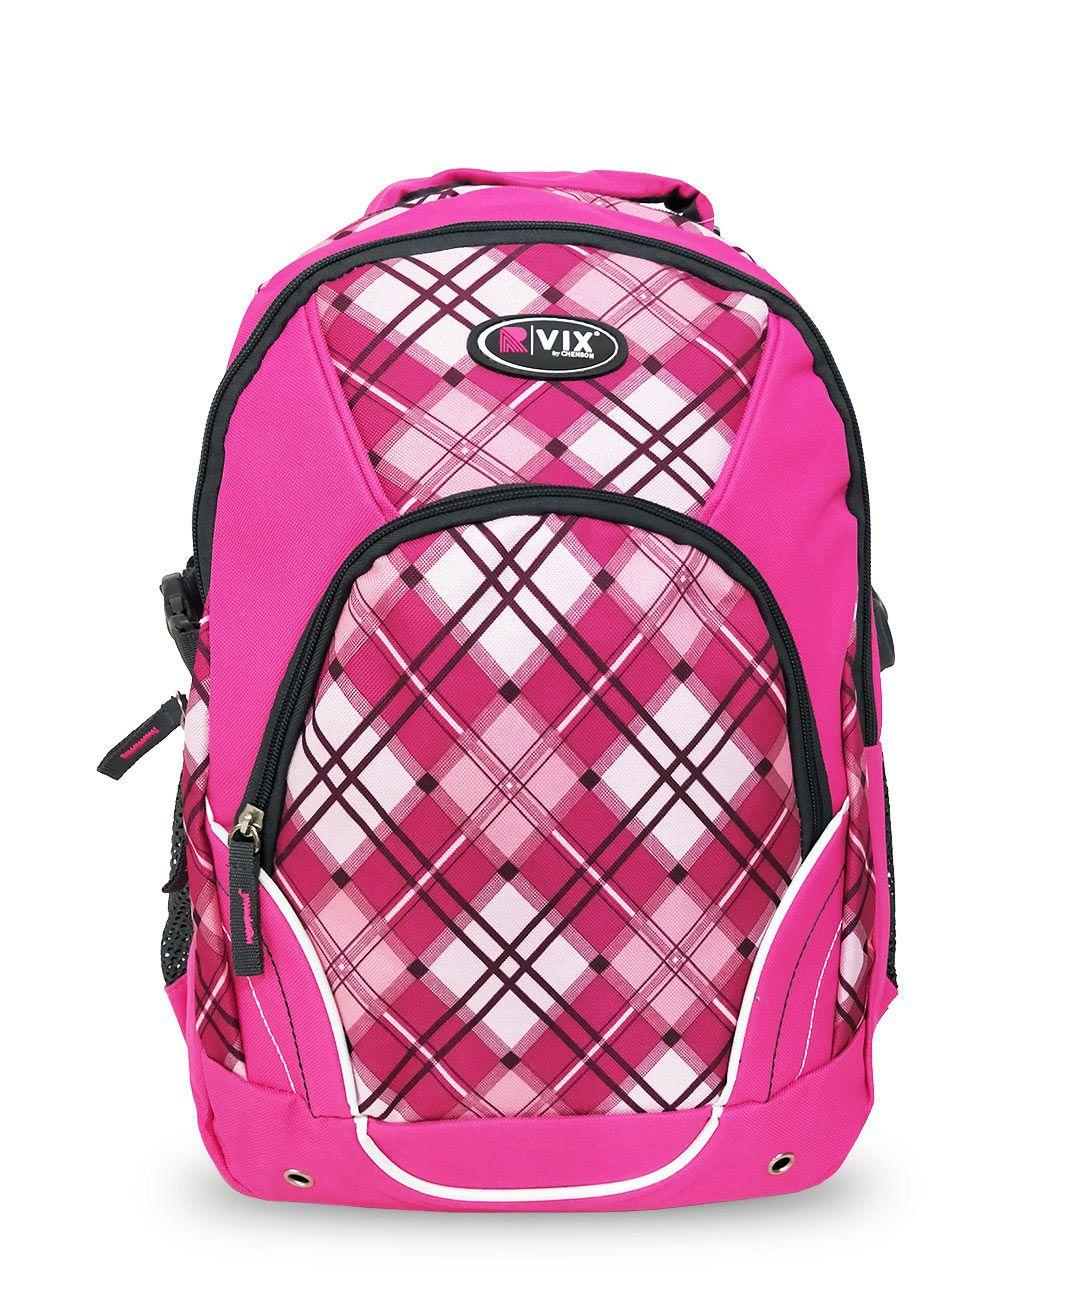 Mochila Feminino Escolar Notebook Resistente Vix 35610 Rosa